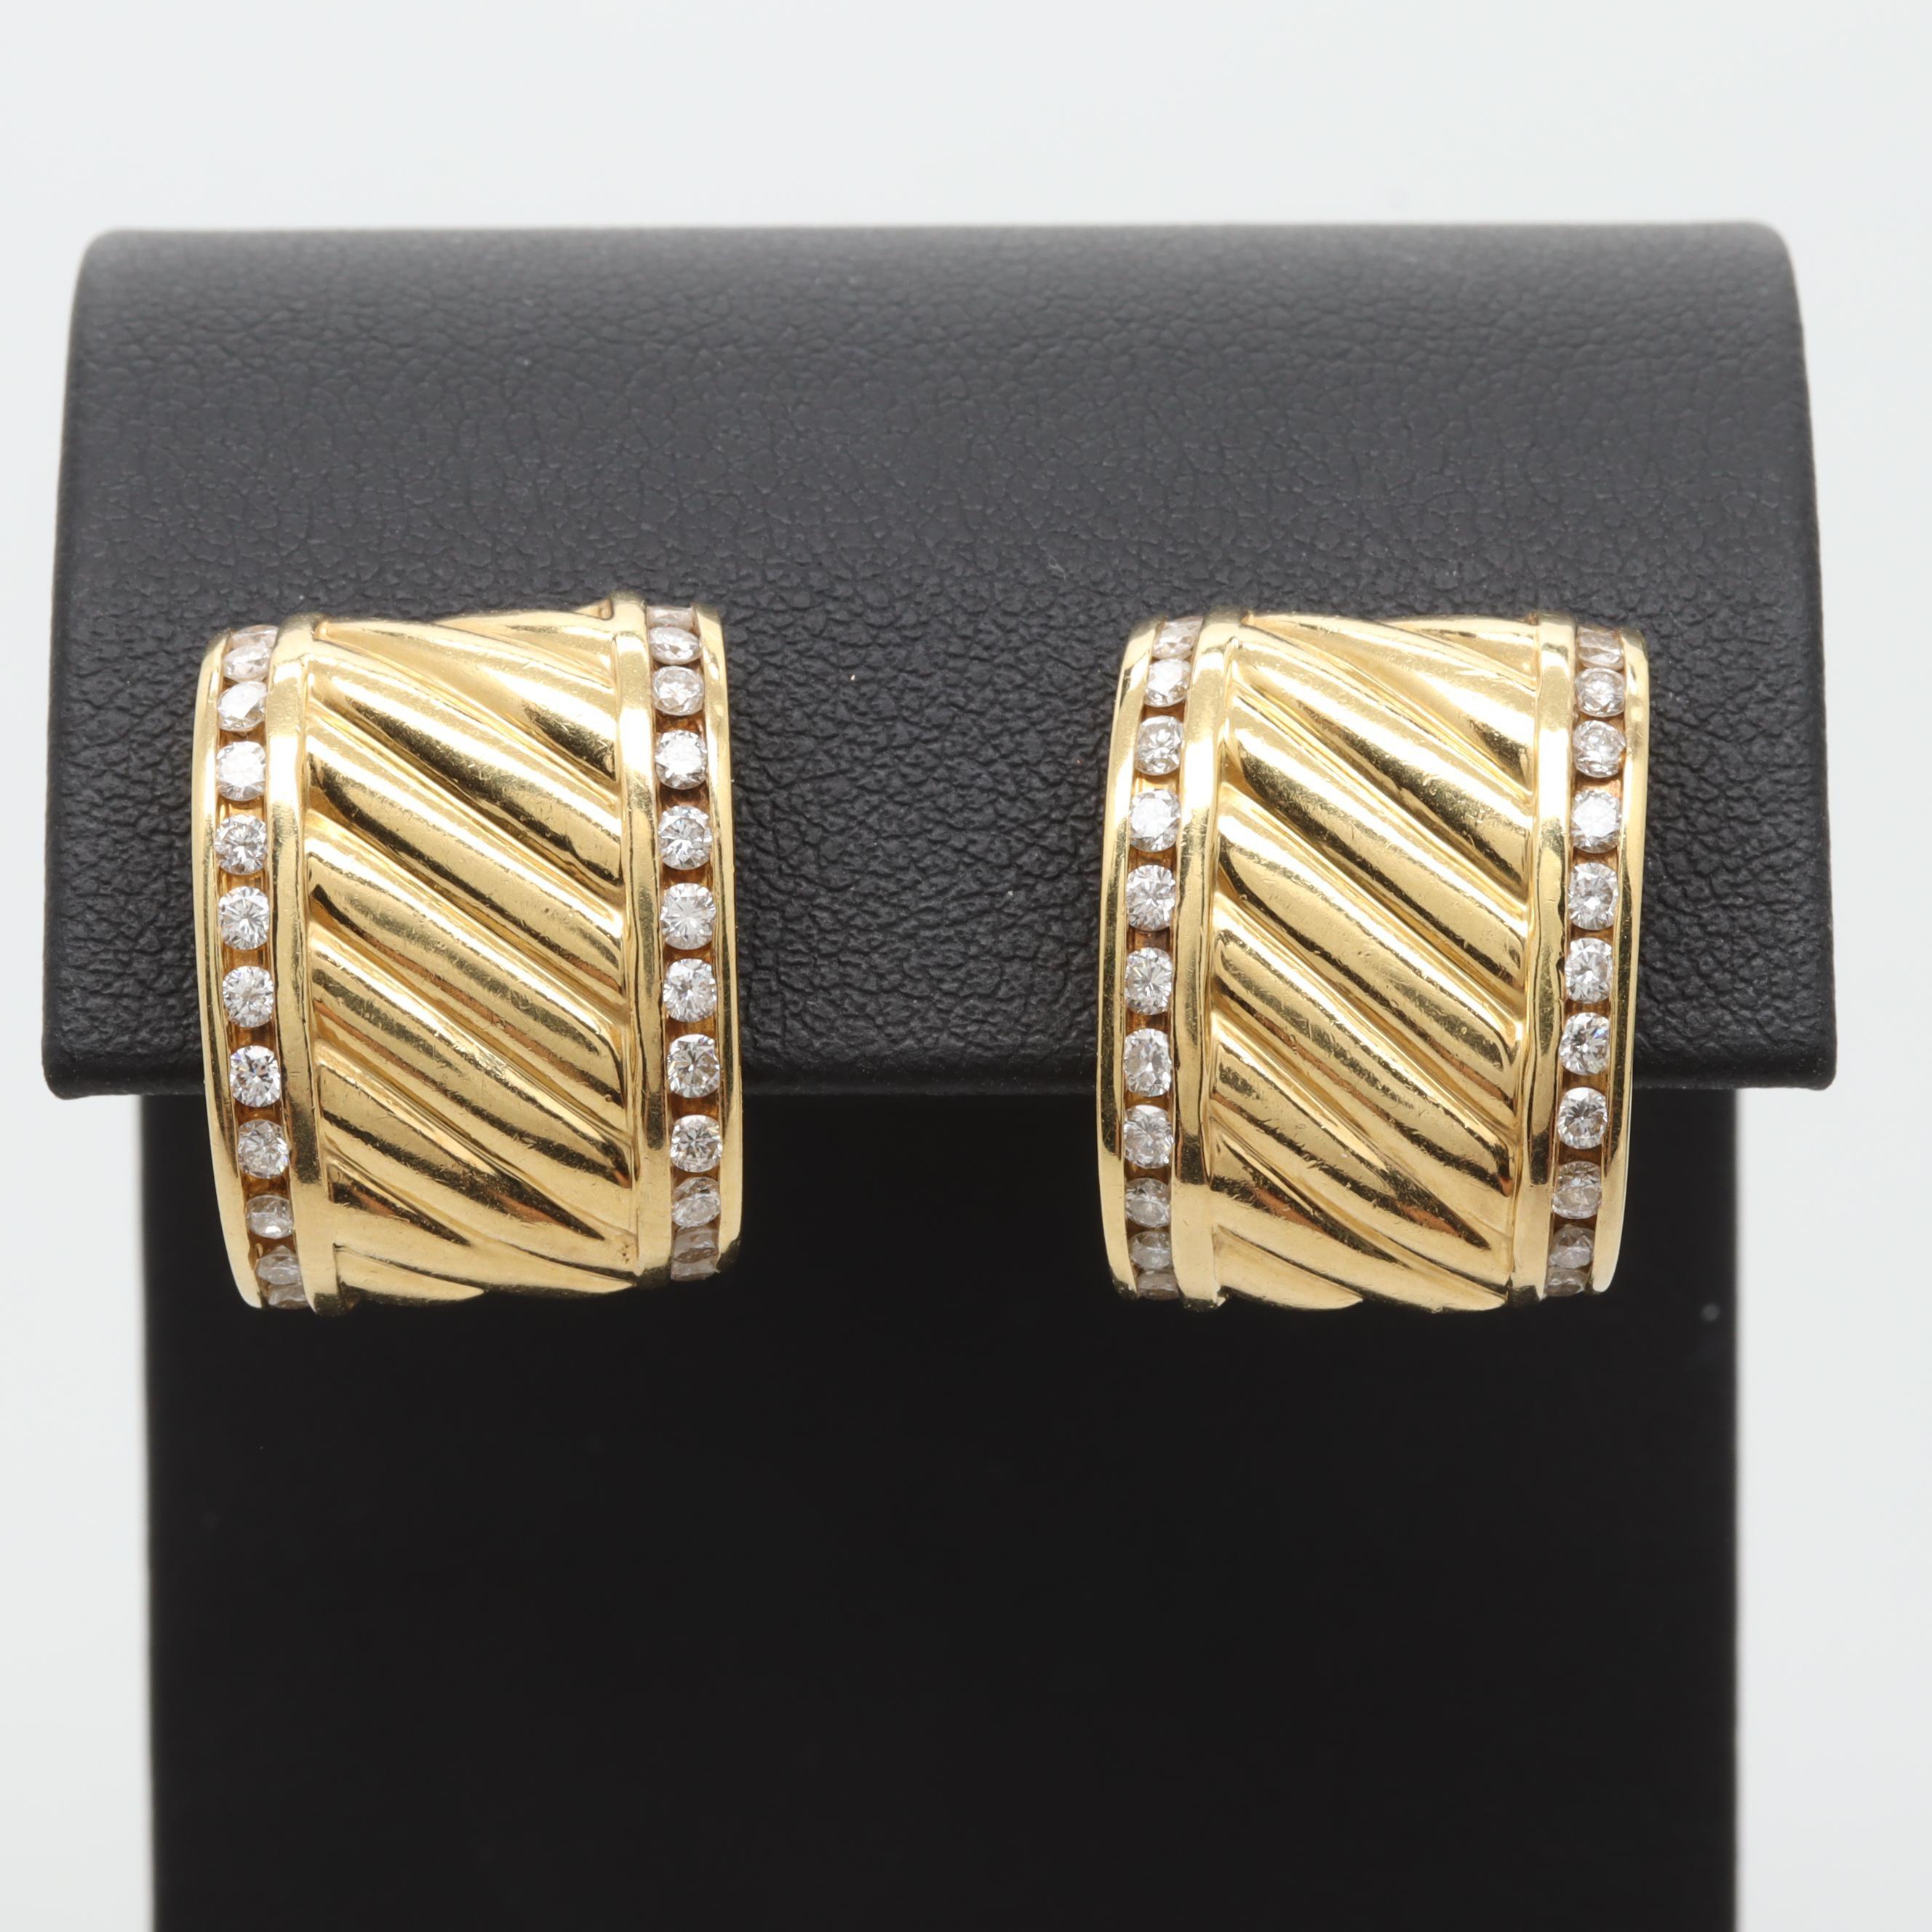 David Yurman 18K Yellow Gold Diamond C-Hoops